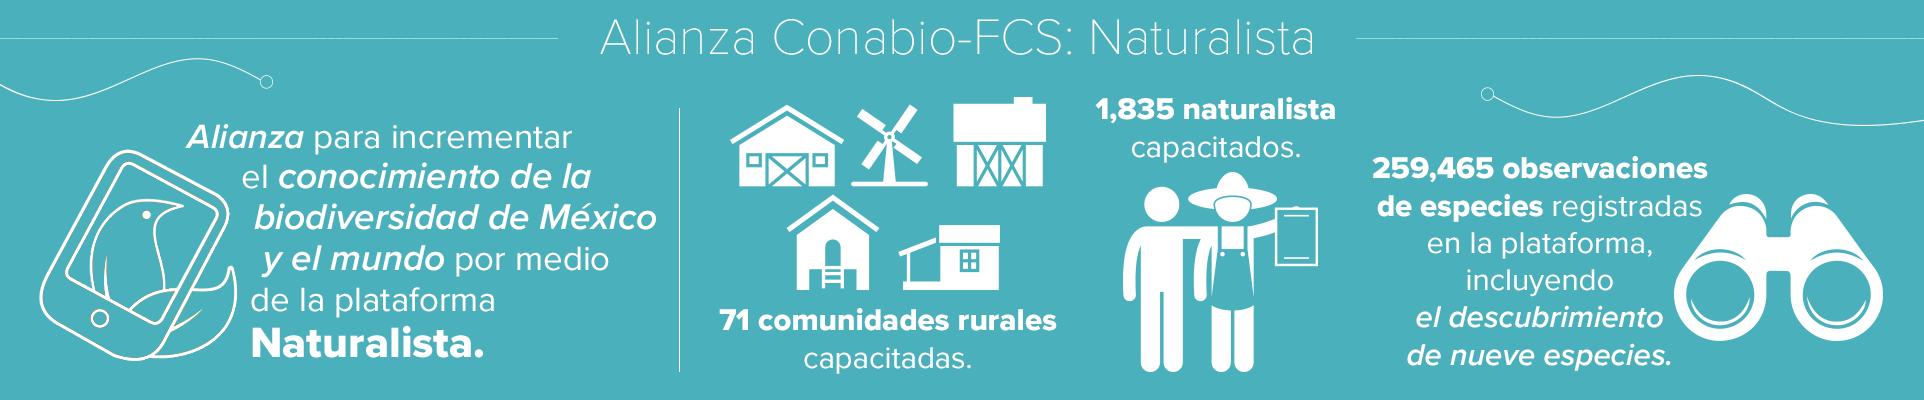 Alianza Conabio-FCS: Naturalista